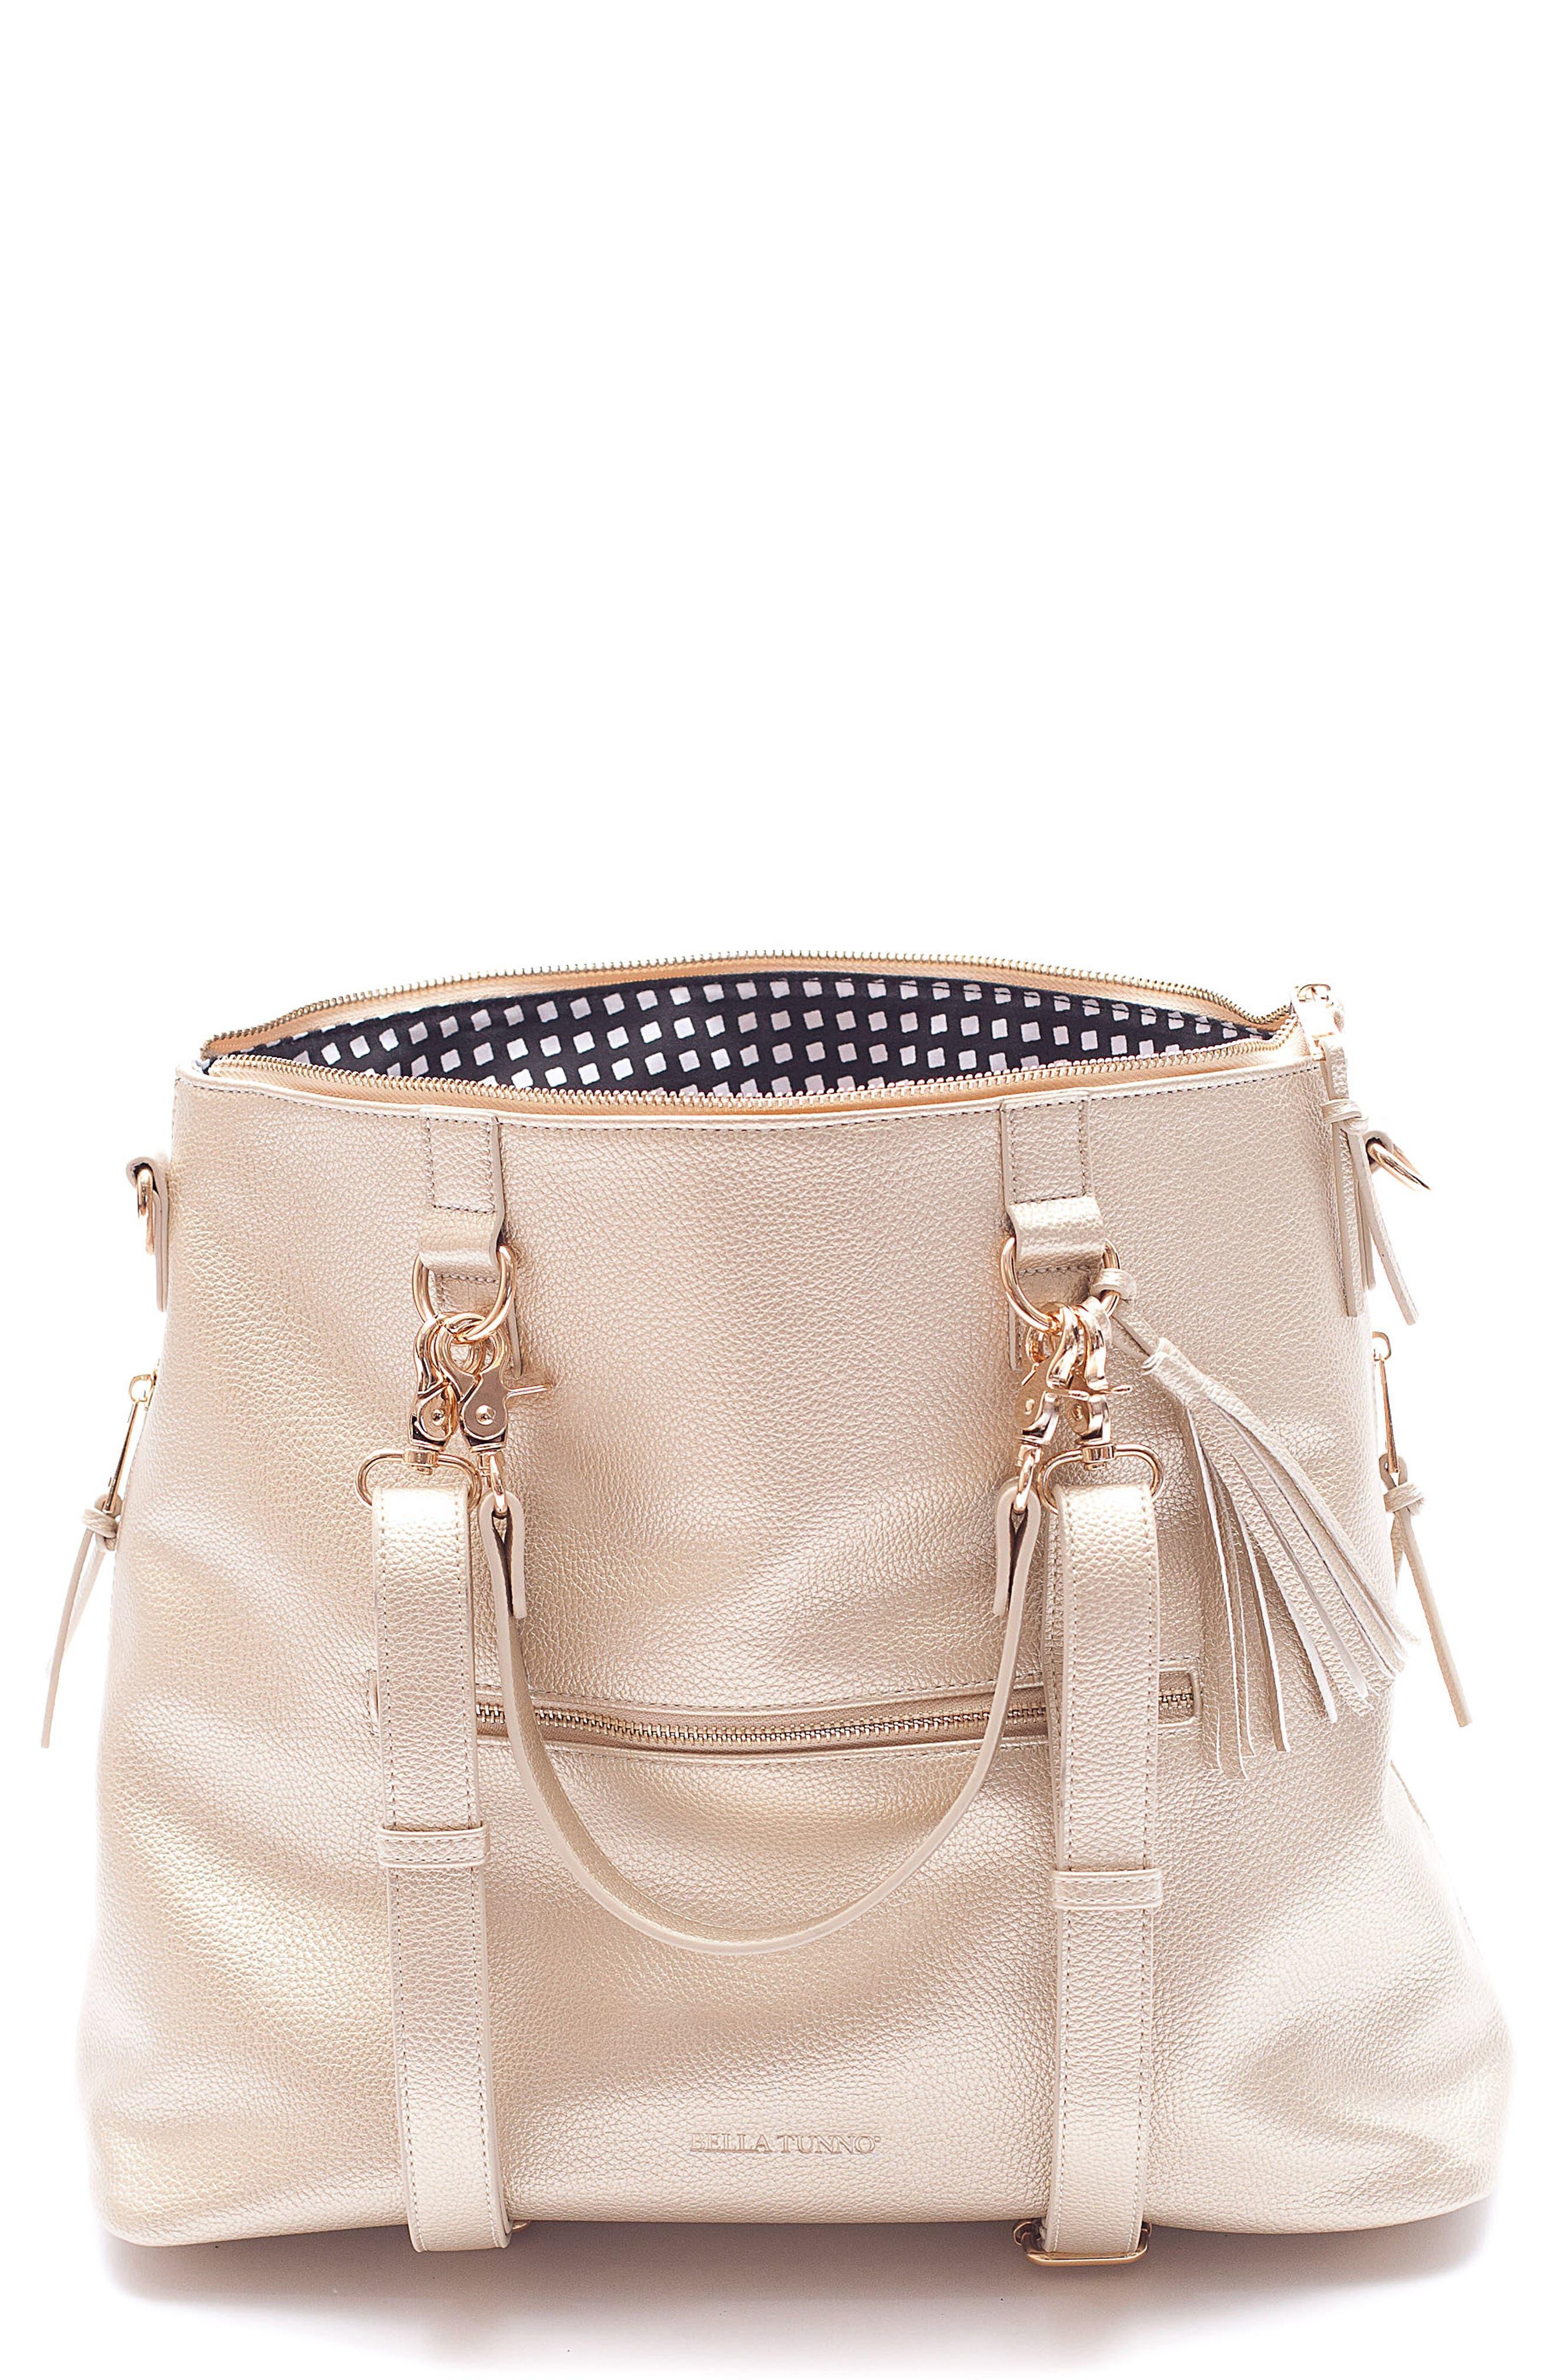 Bella Tunno Boss Convertible Diaper Backpack